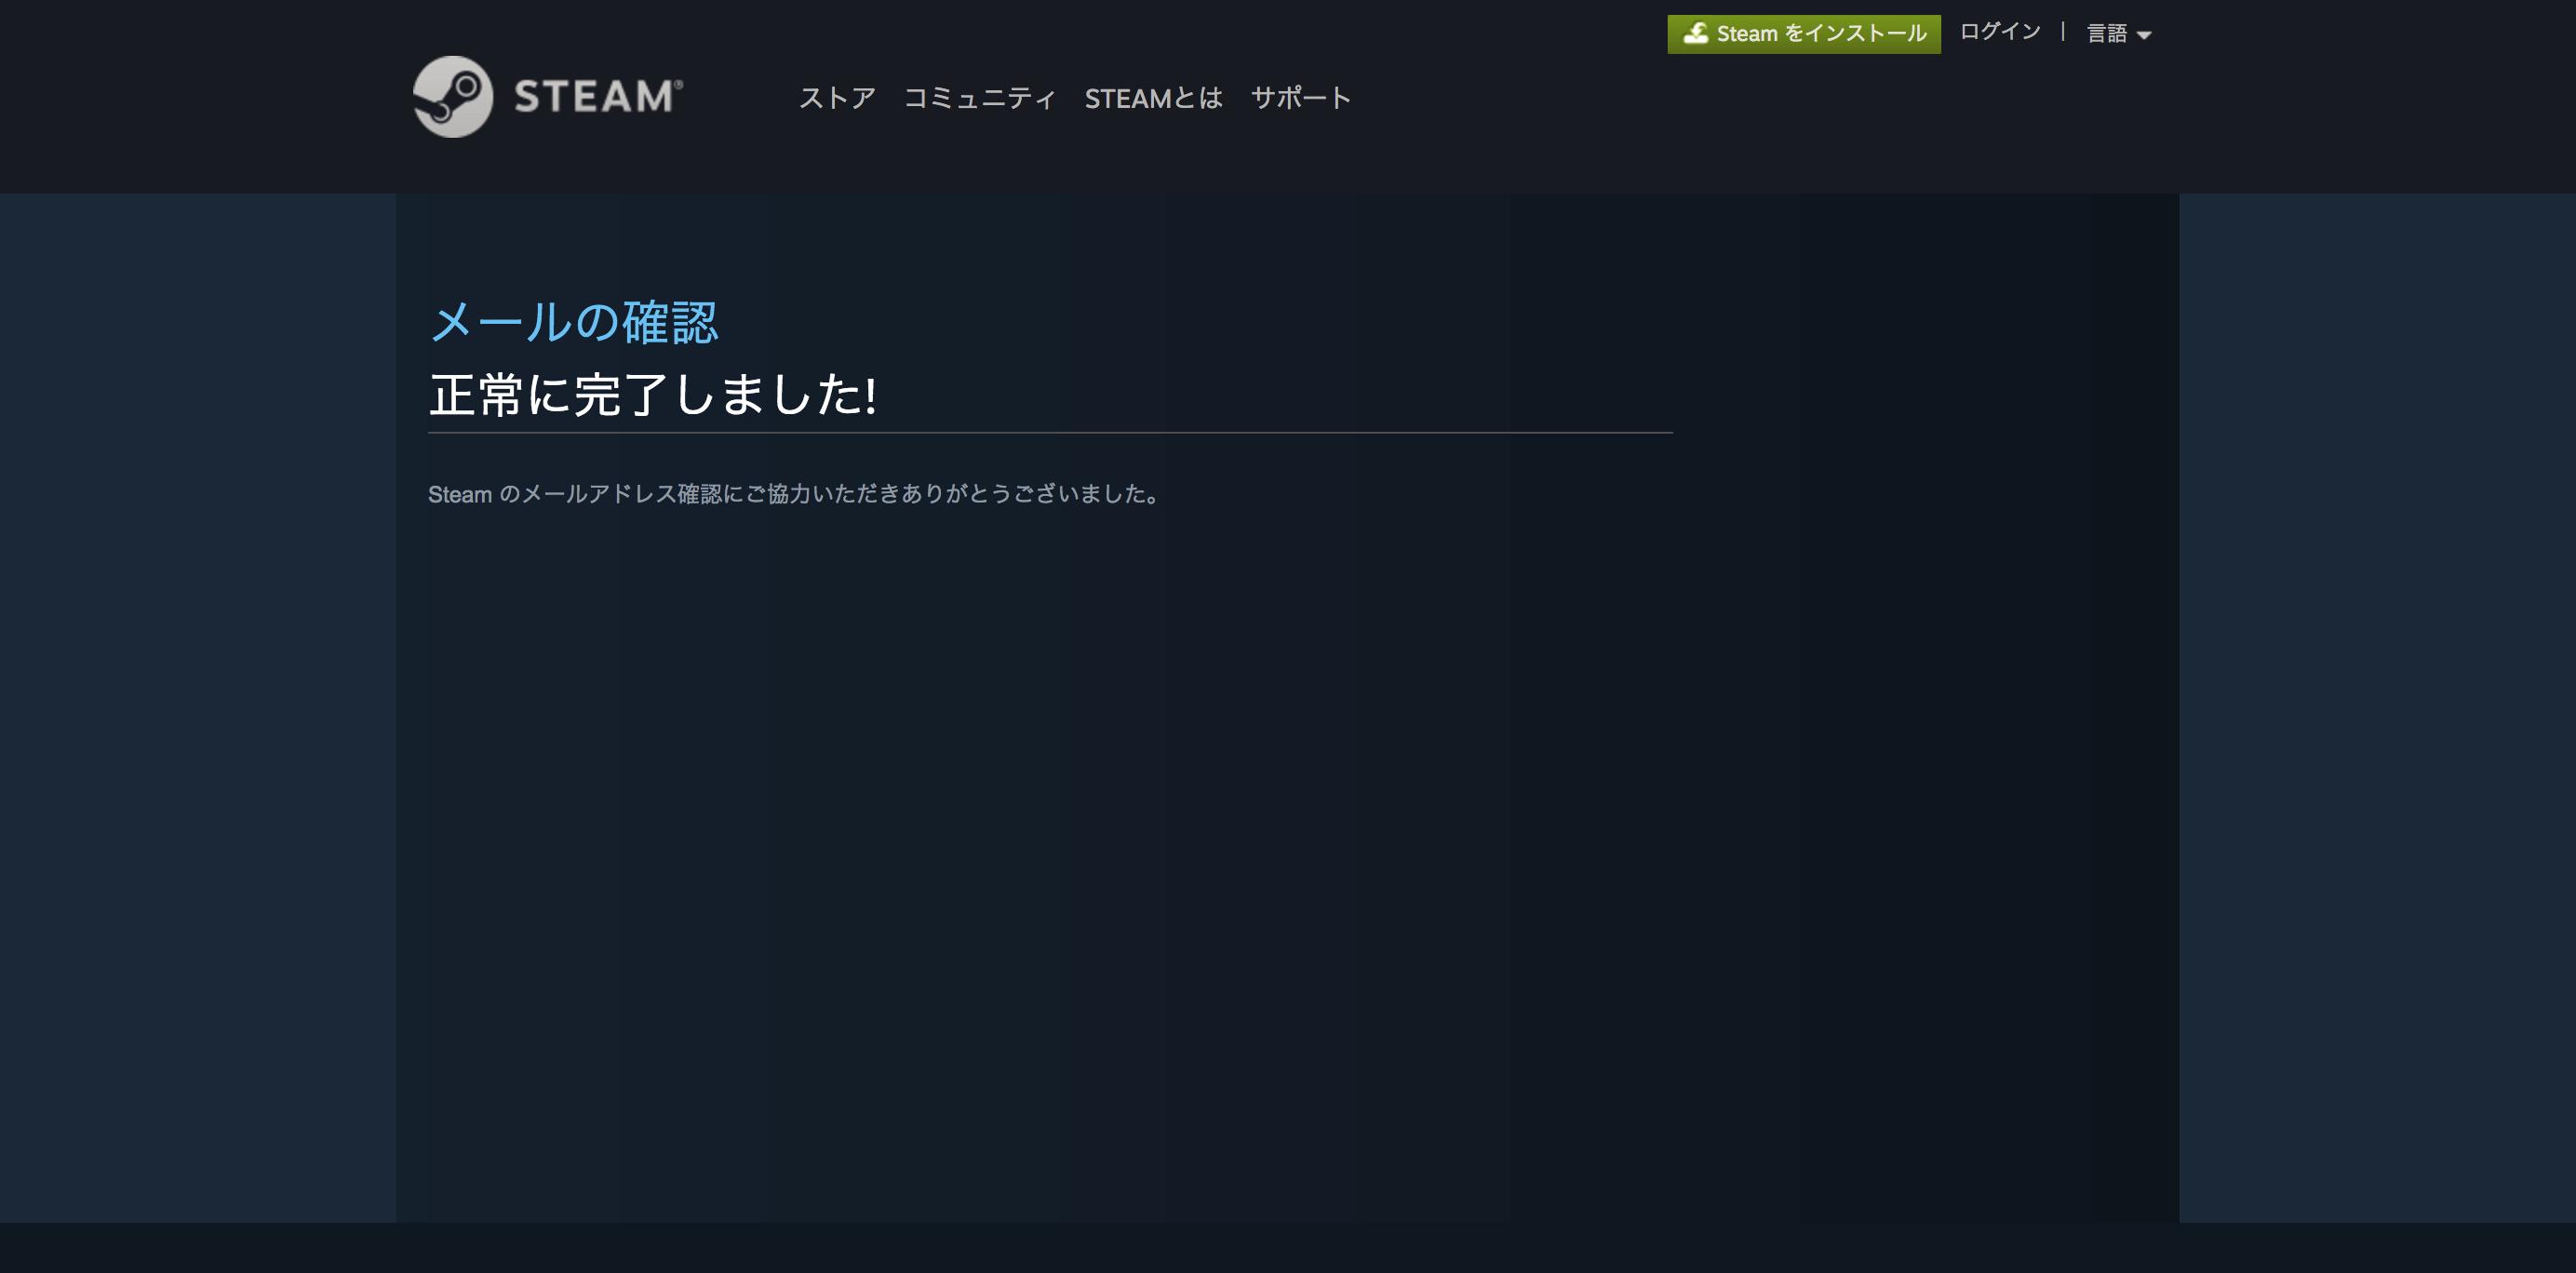 steamアカウント作成完了